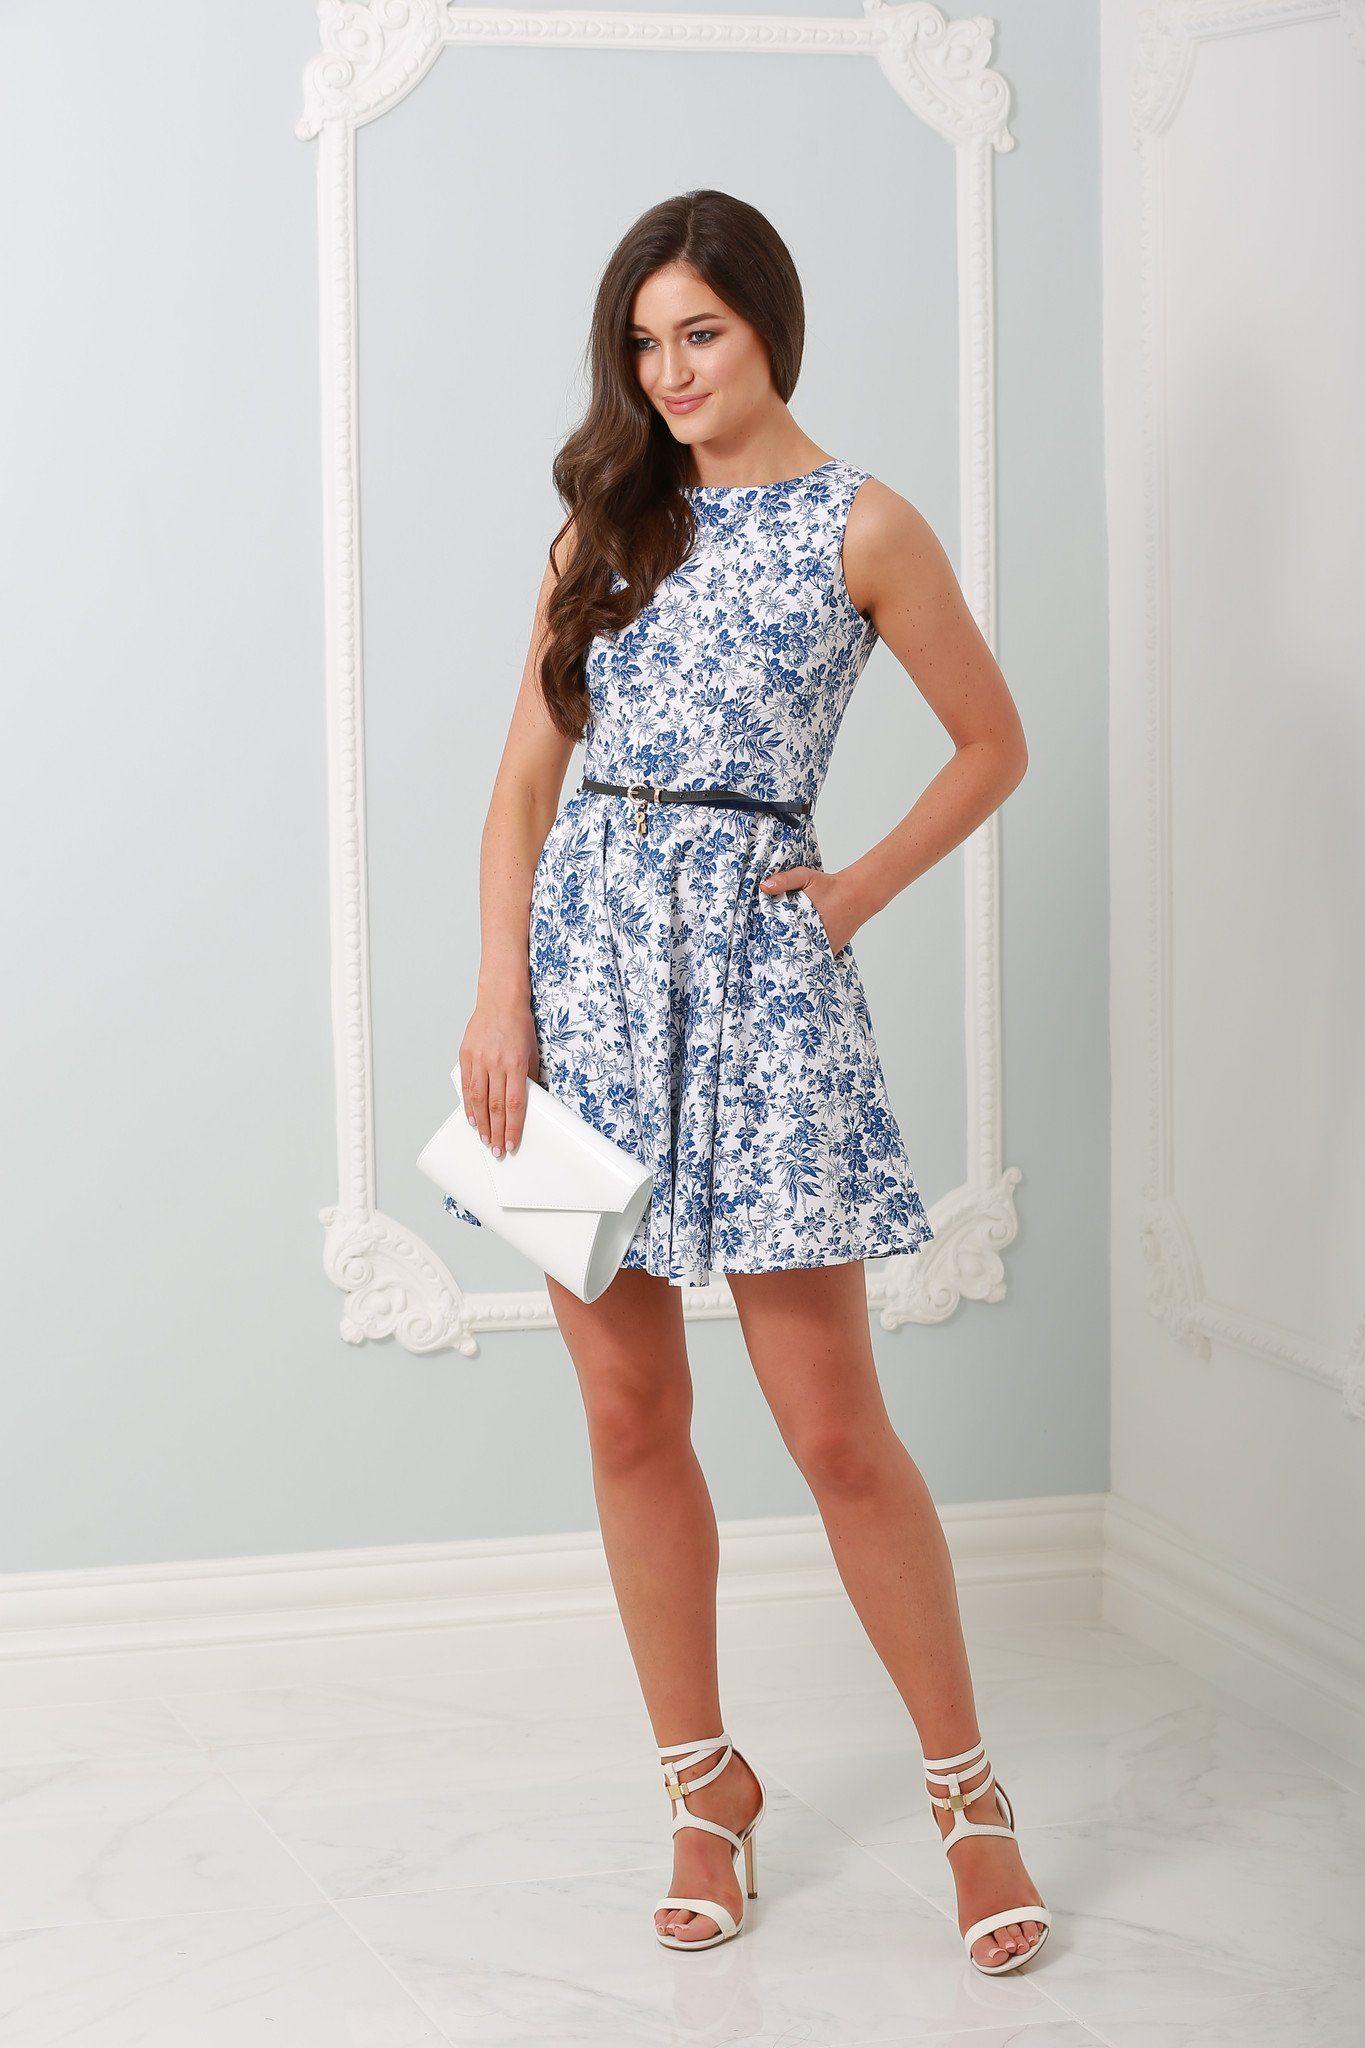 Tahlia blue and white cottage flower dress dress newin tahlia blue and white cottage flower dress dress newin instafashion dresses izmirmasajfo